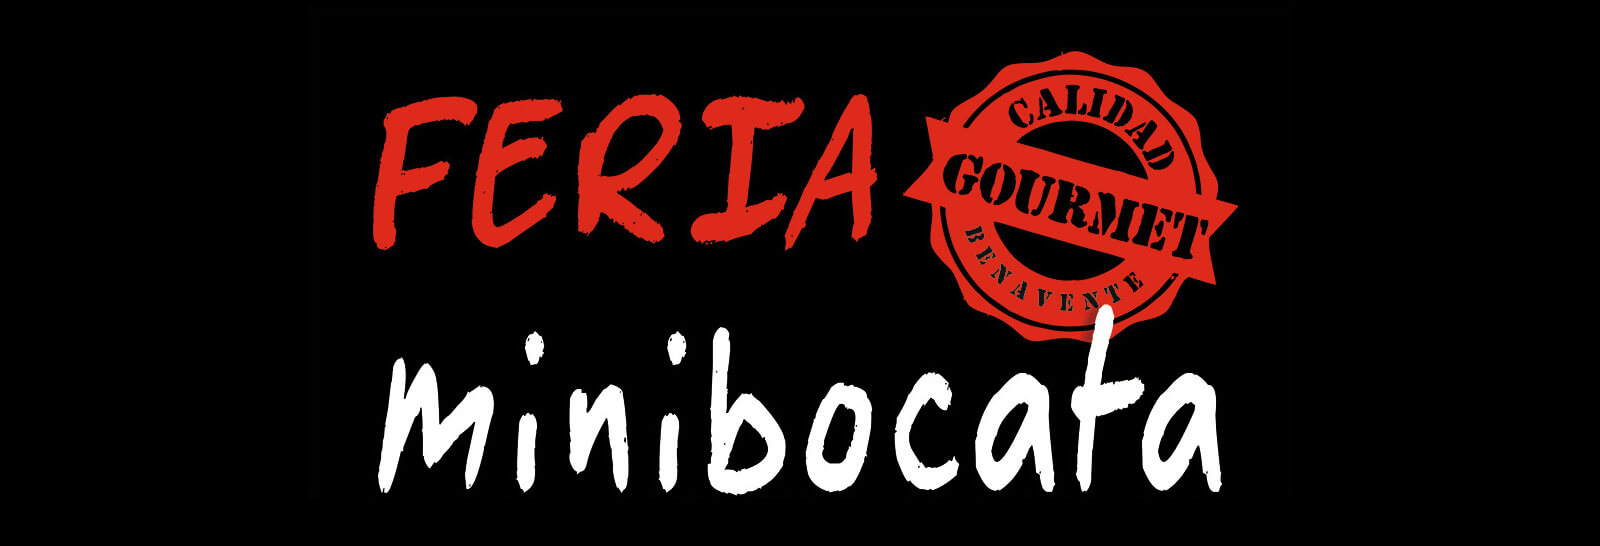 II Feria del Mini Bocadillo Gourmet en Benavente